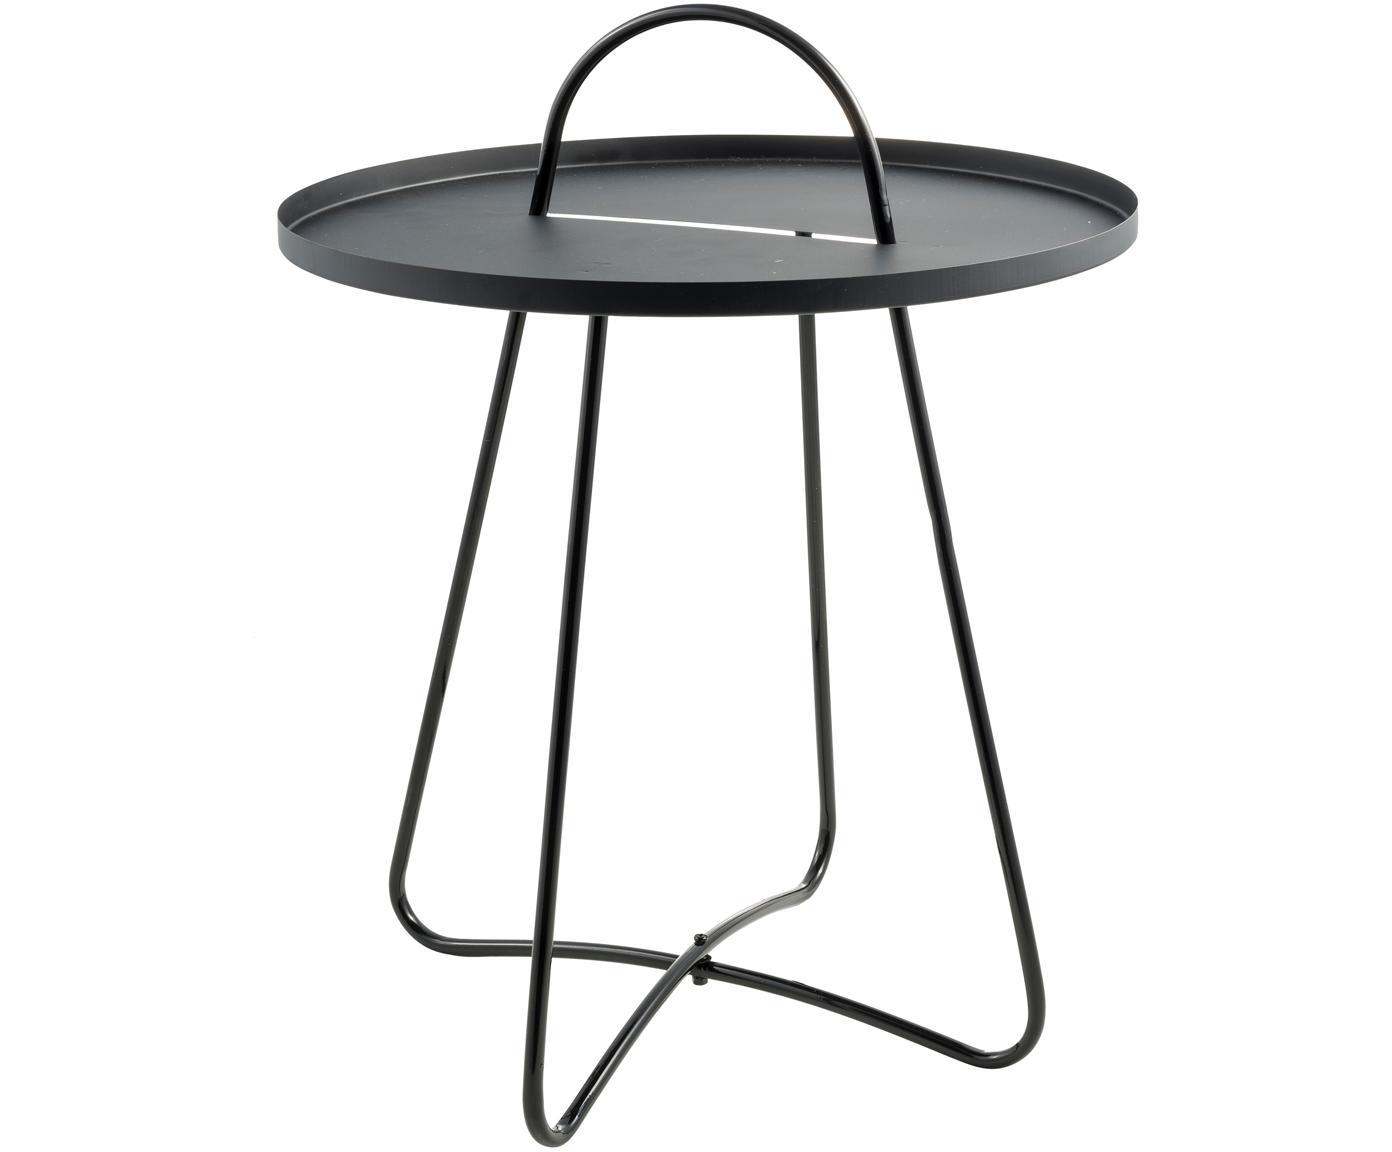 Mesa auxiliar de metal Pronto, Metal recubierto, Negro, Ø 46 x Al 58 cm